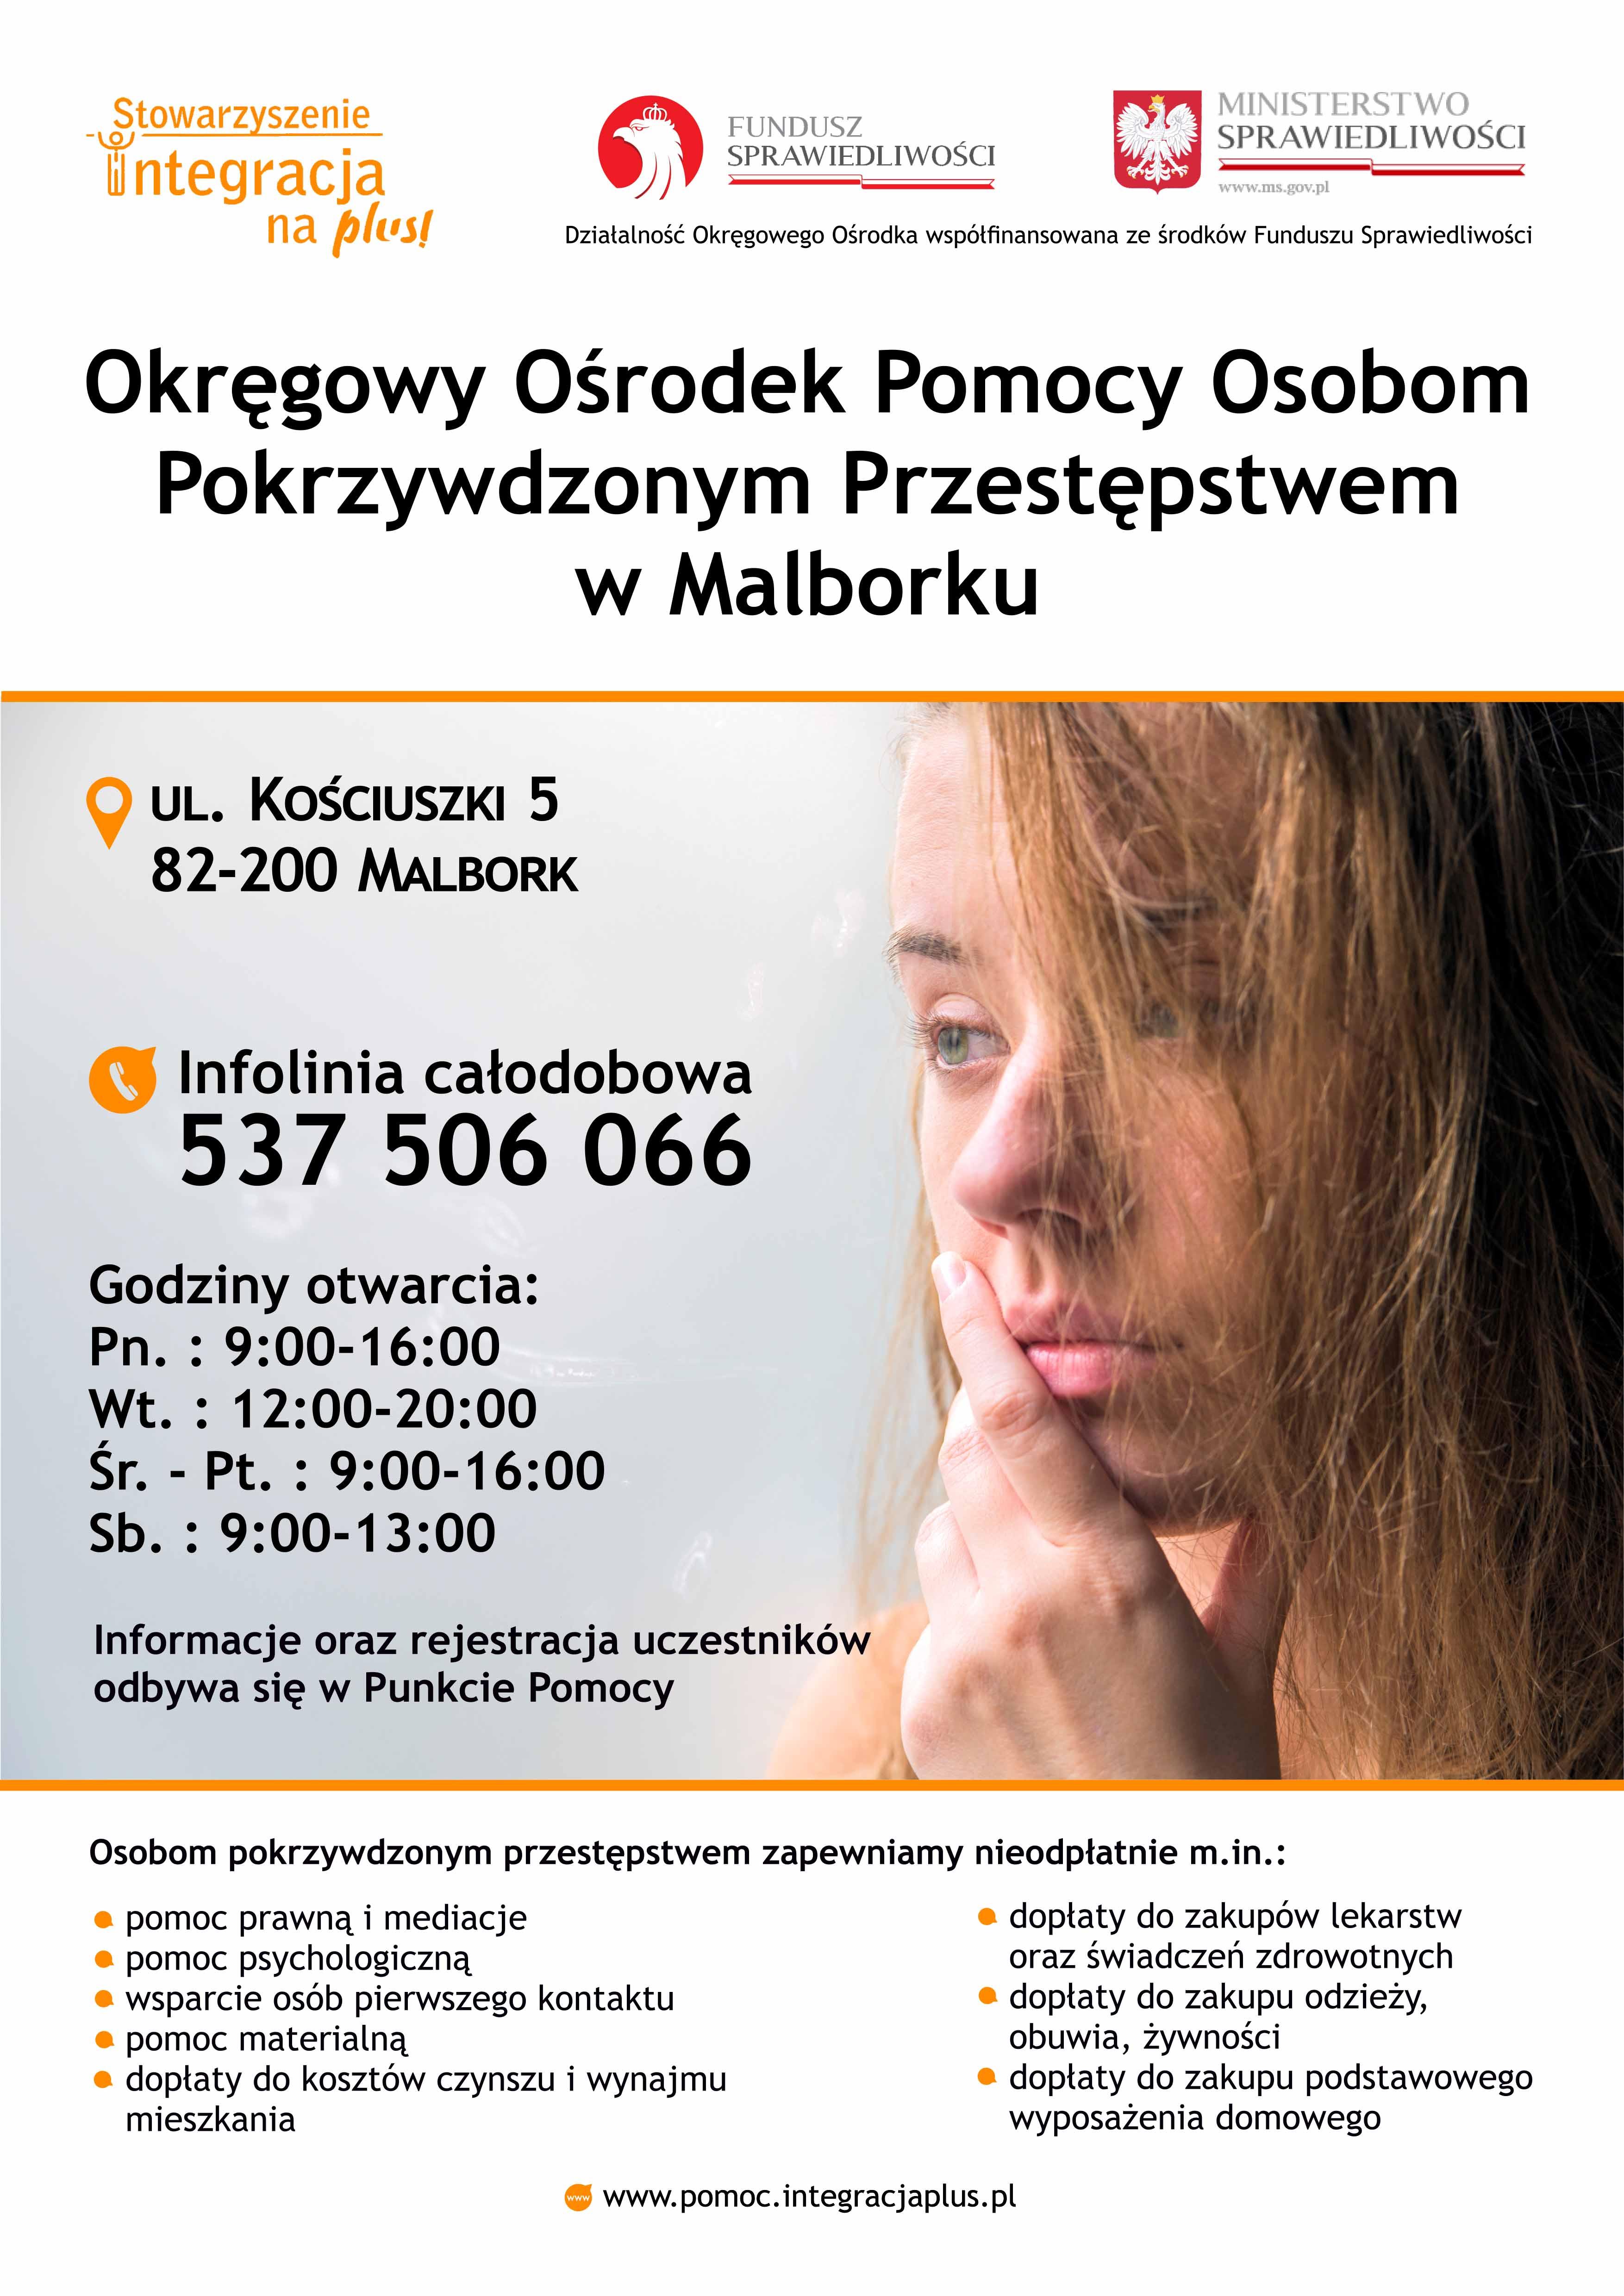 http://m.82-200.pl/2019/02/orig/plakat-malbork-4150.jpg